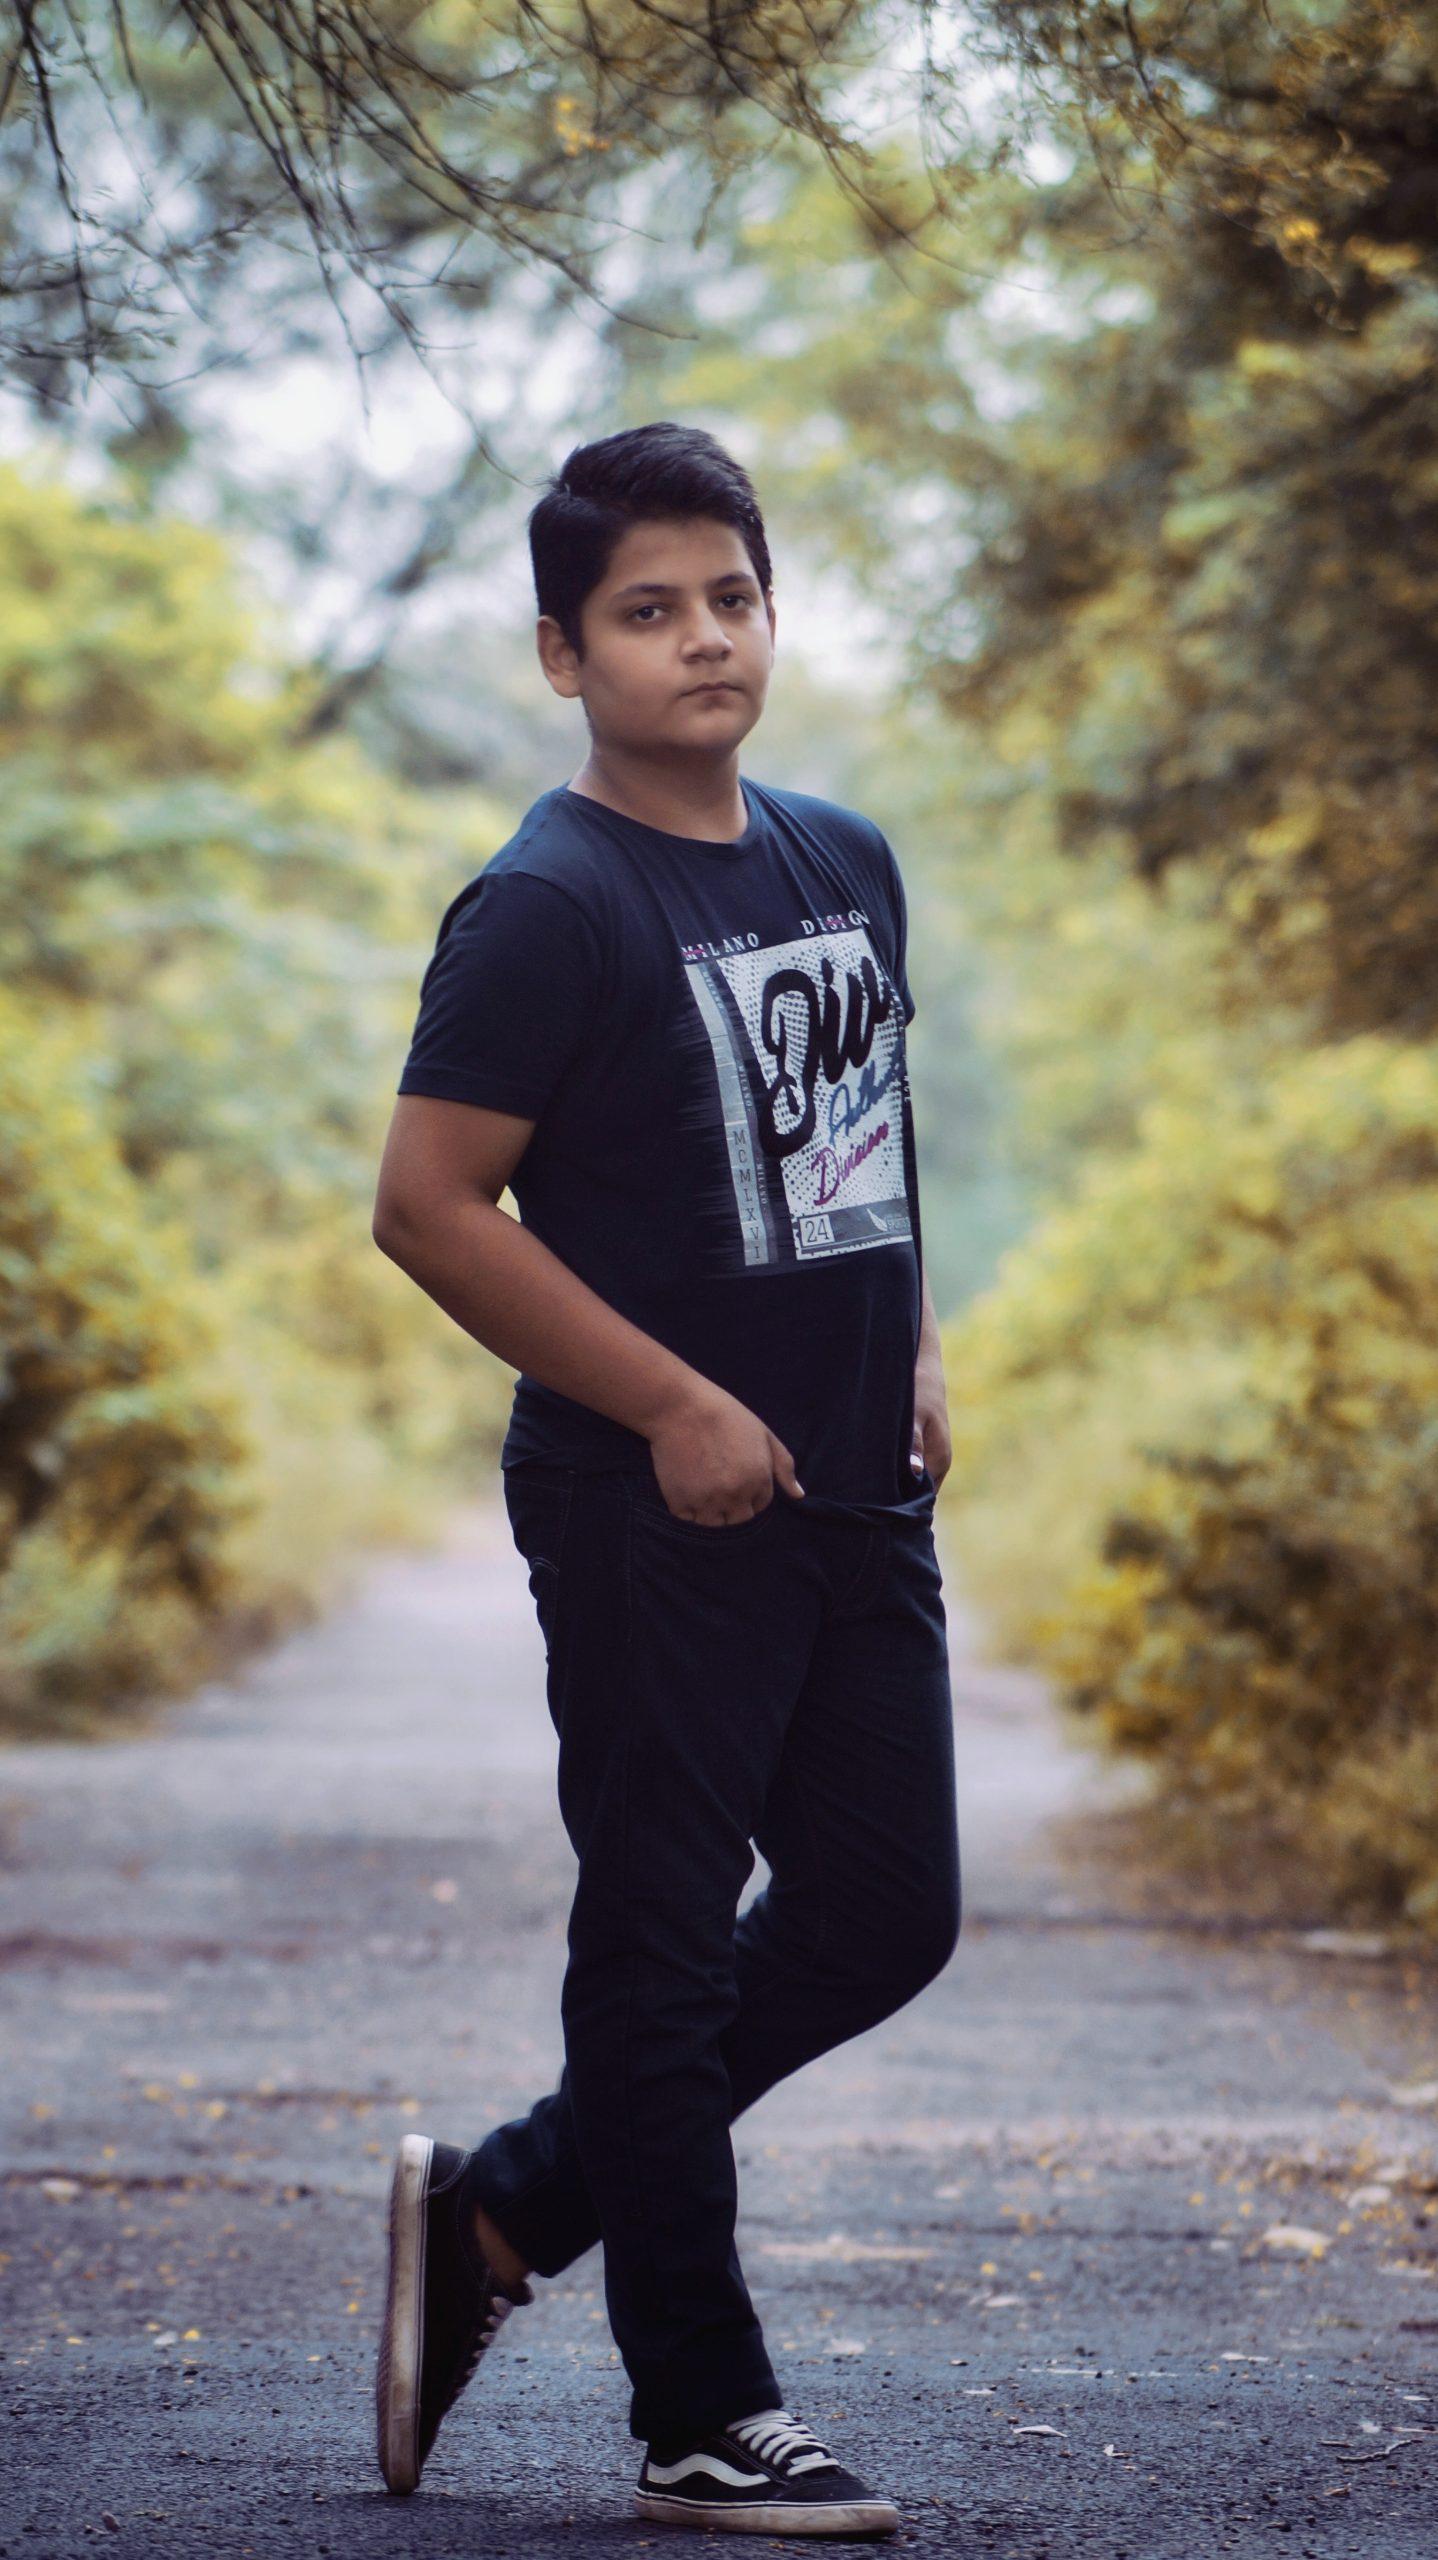 Full body shot of a Boy